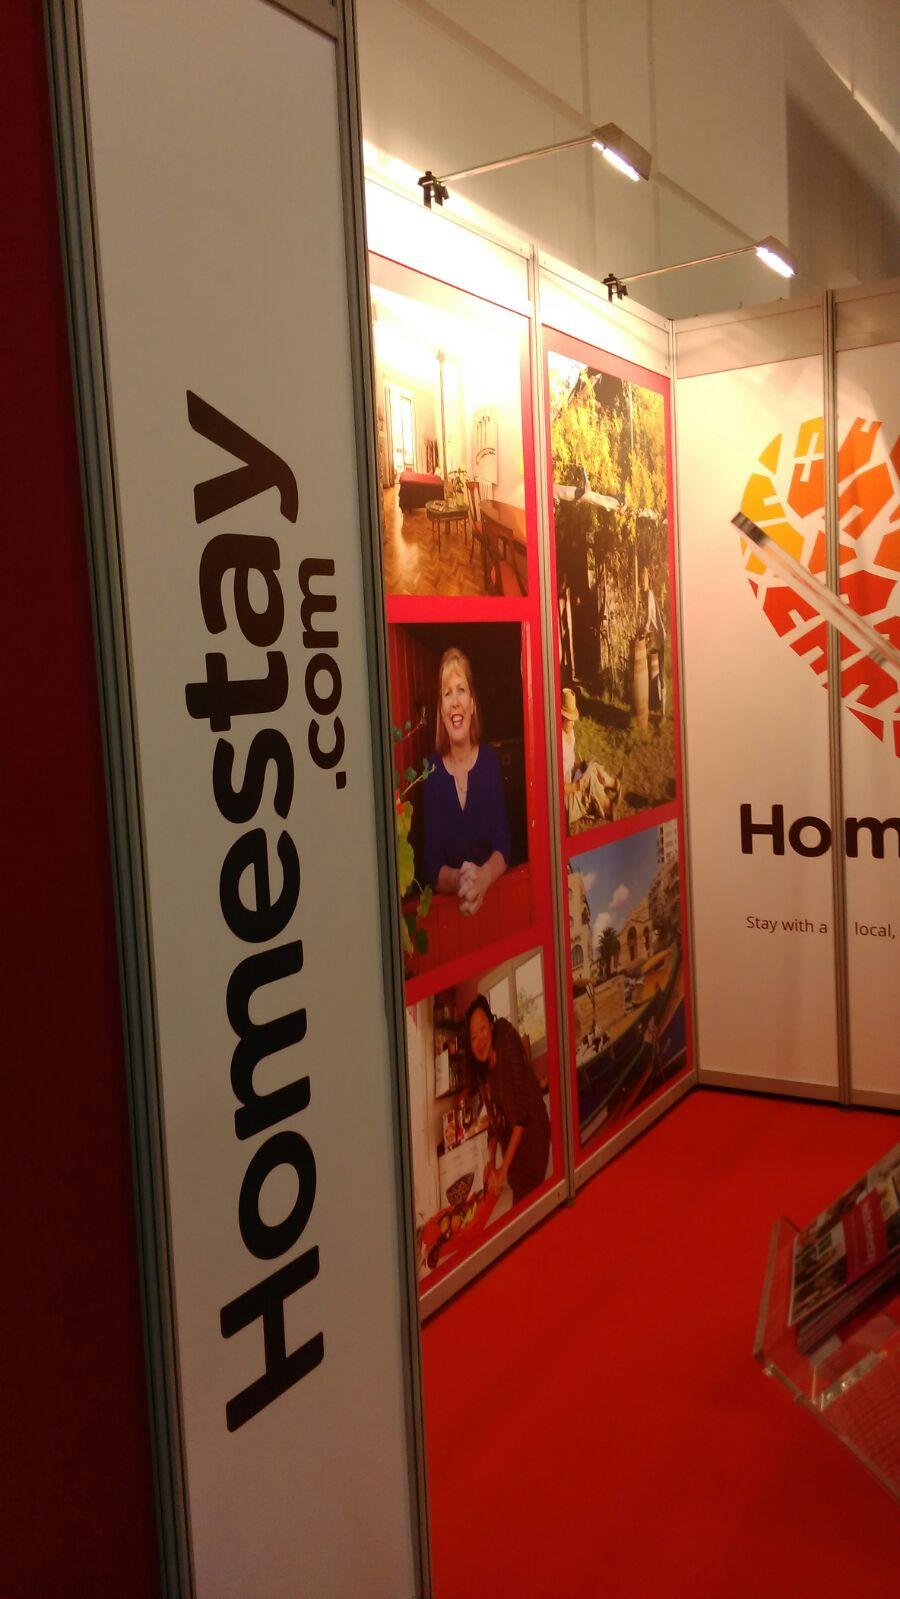 Homestay_ITB_Stall_Design_9b84dc3b-a66f-4840-bb7e-0964ffdd6b8b